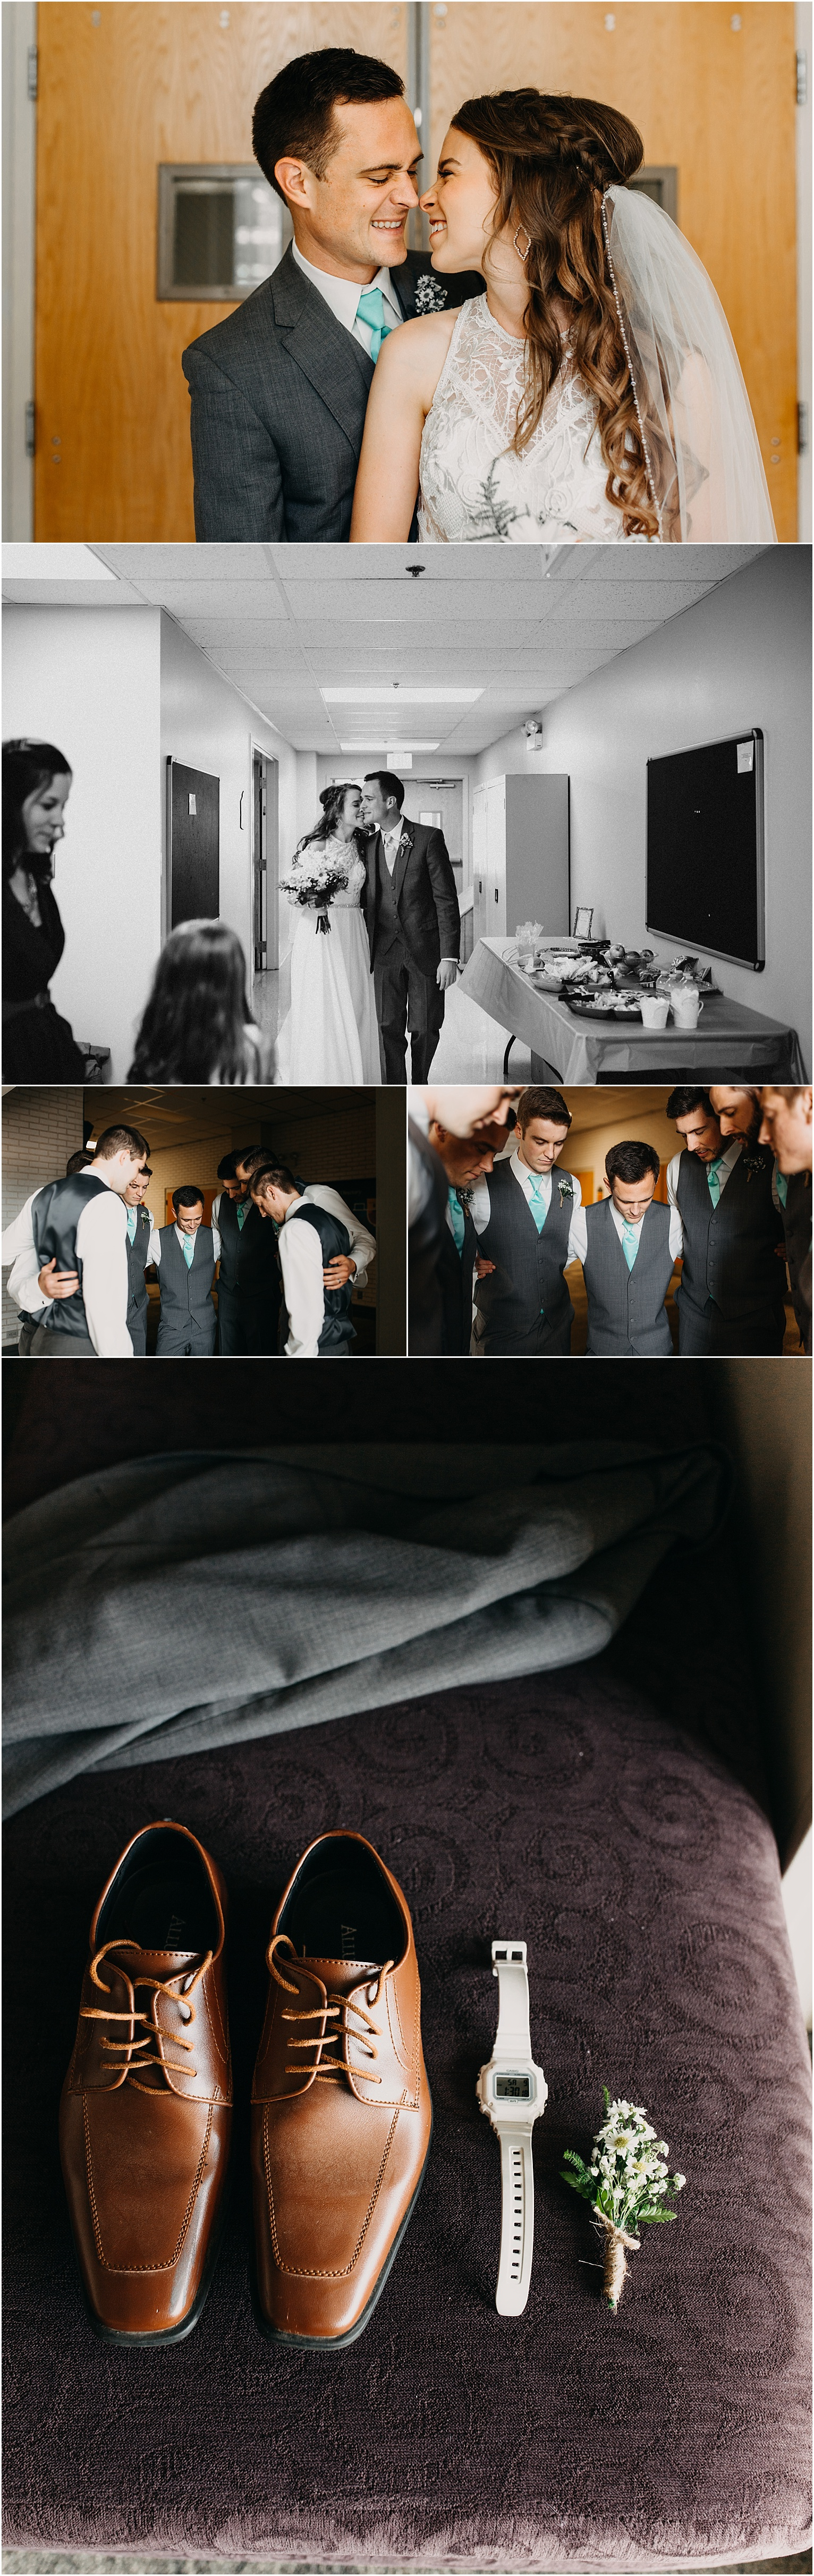 church-venue-missouri-wedding-photographer_0017.jpg